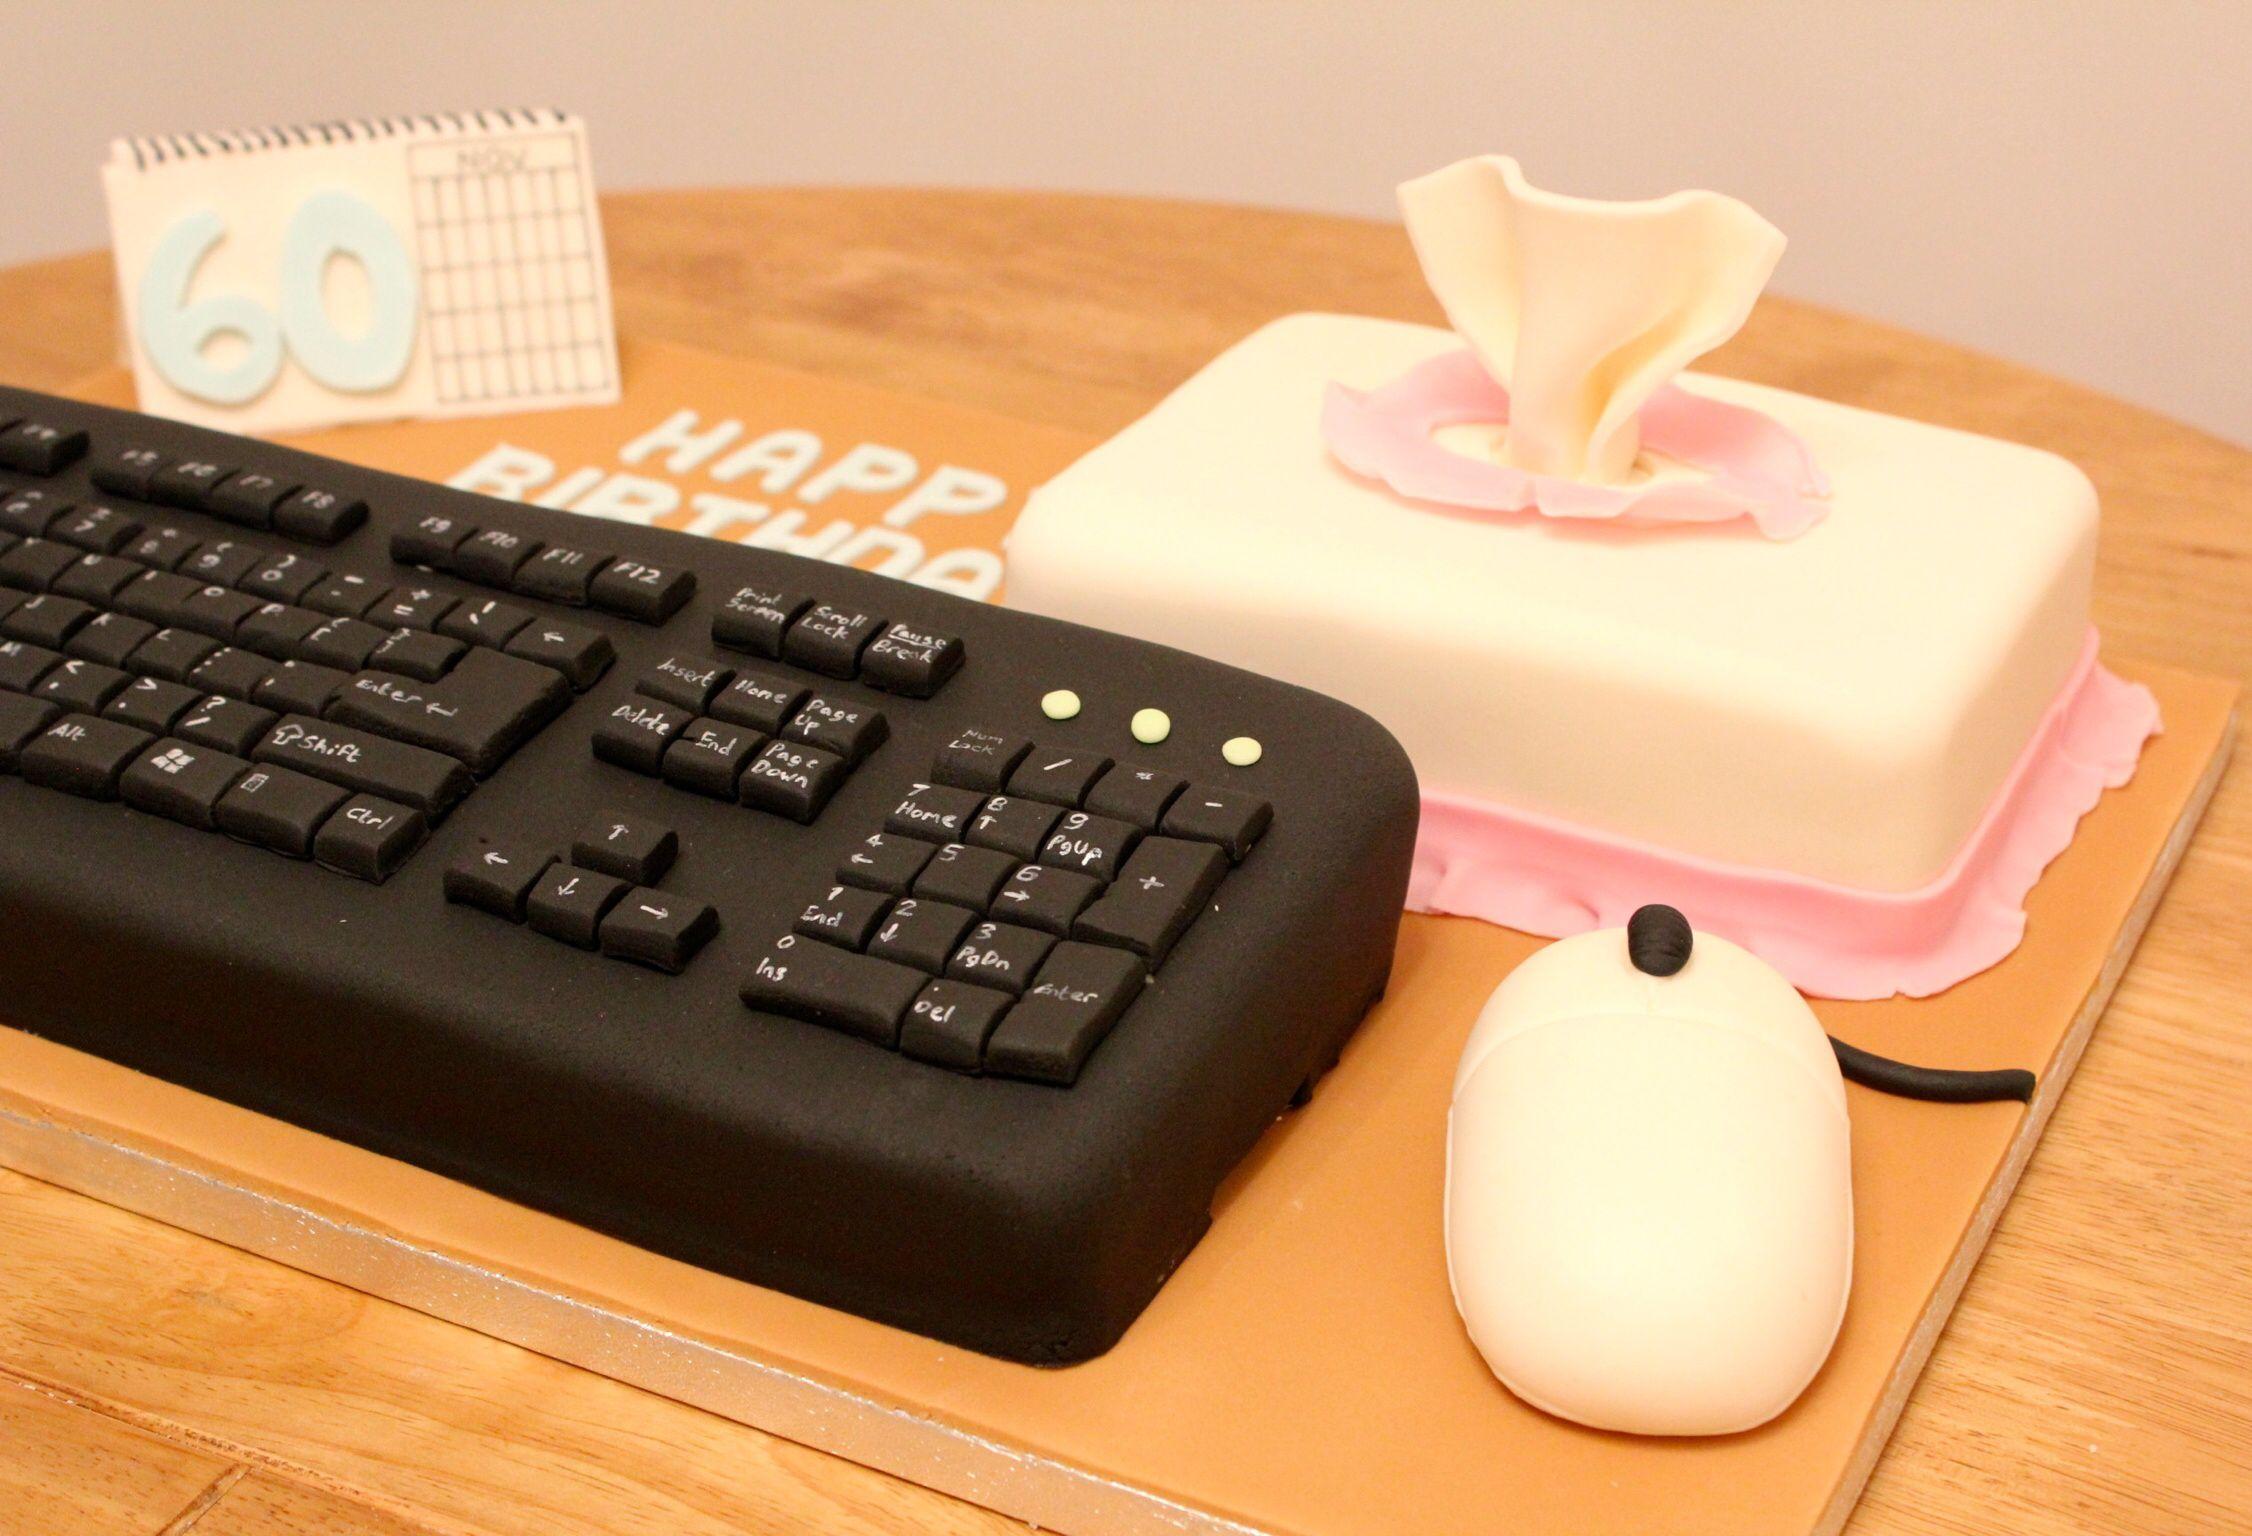 Computer keyboard cake by Fondant Fancy | Cake in 2019 | Computer